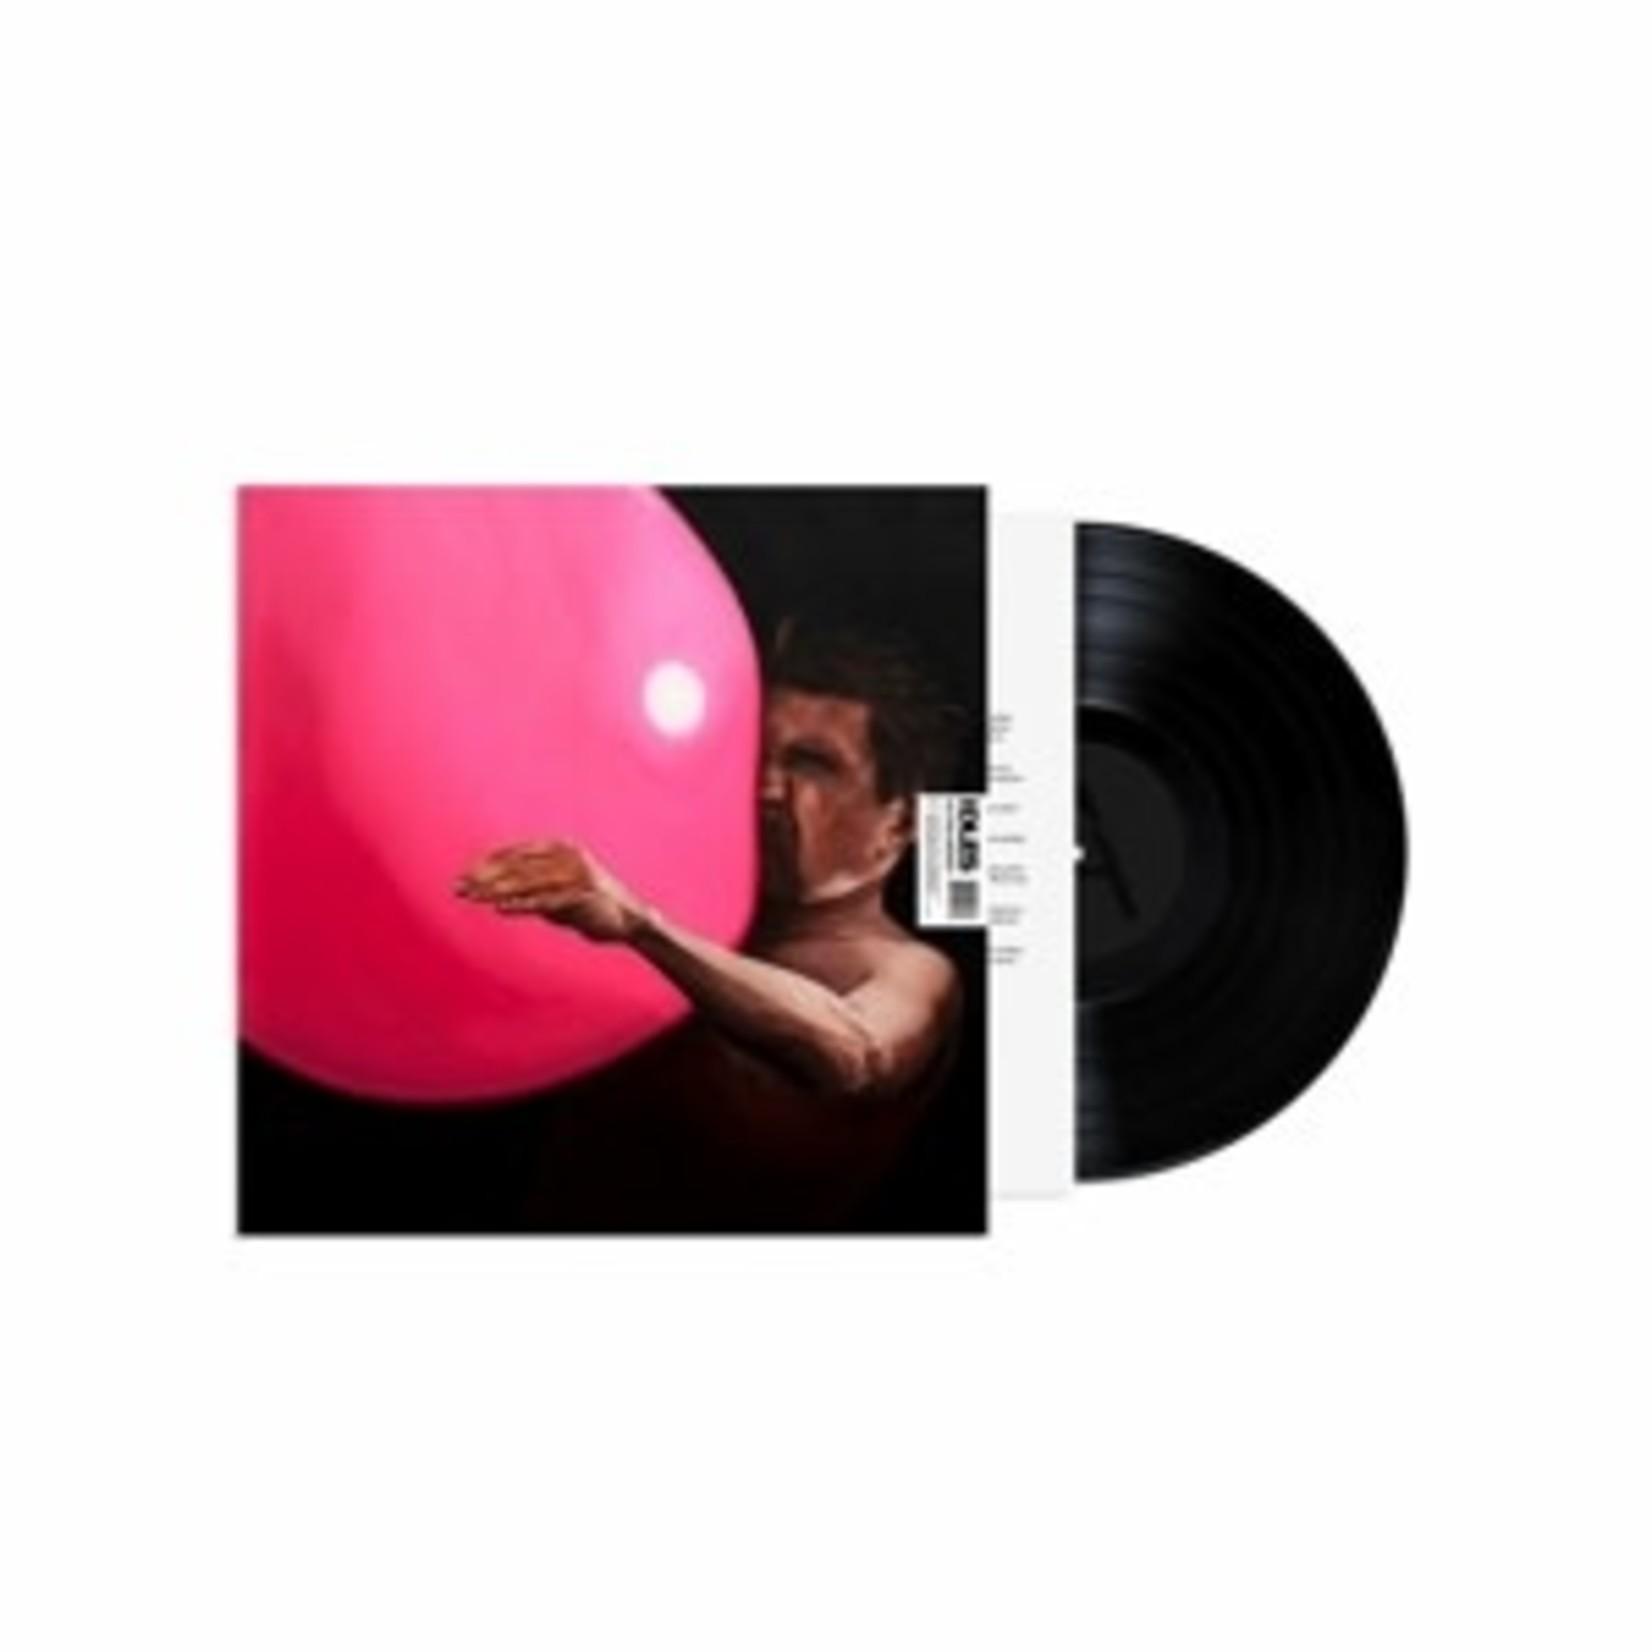 IDLES  - ULTRA MONO zwart vinyl   (VINYL)